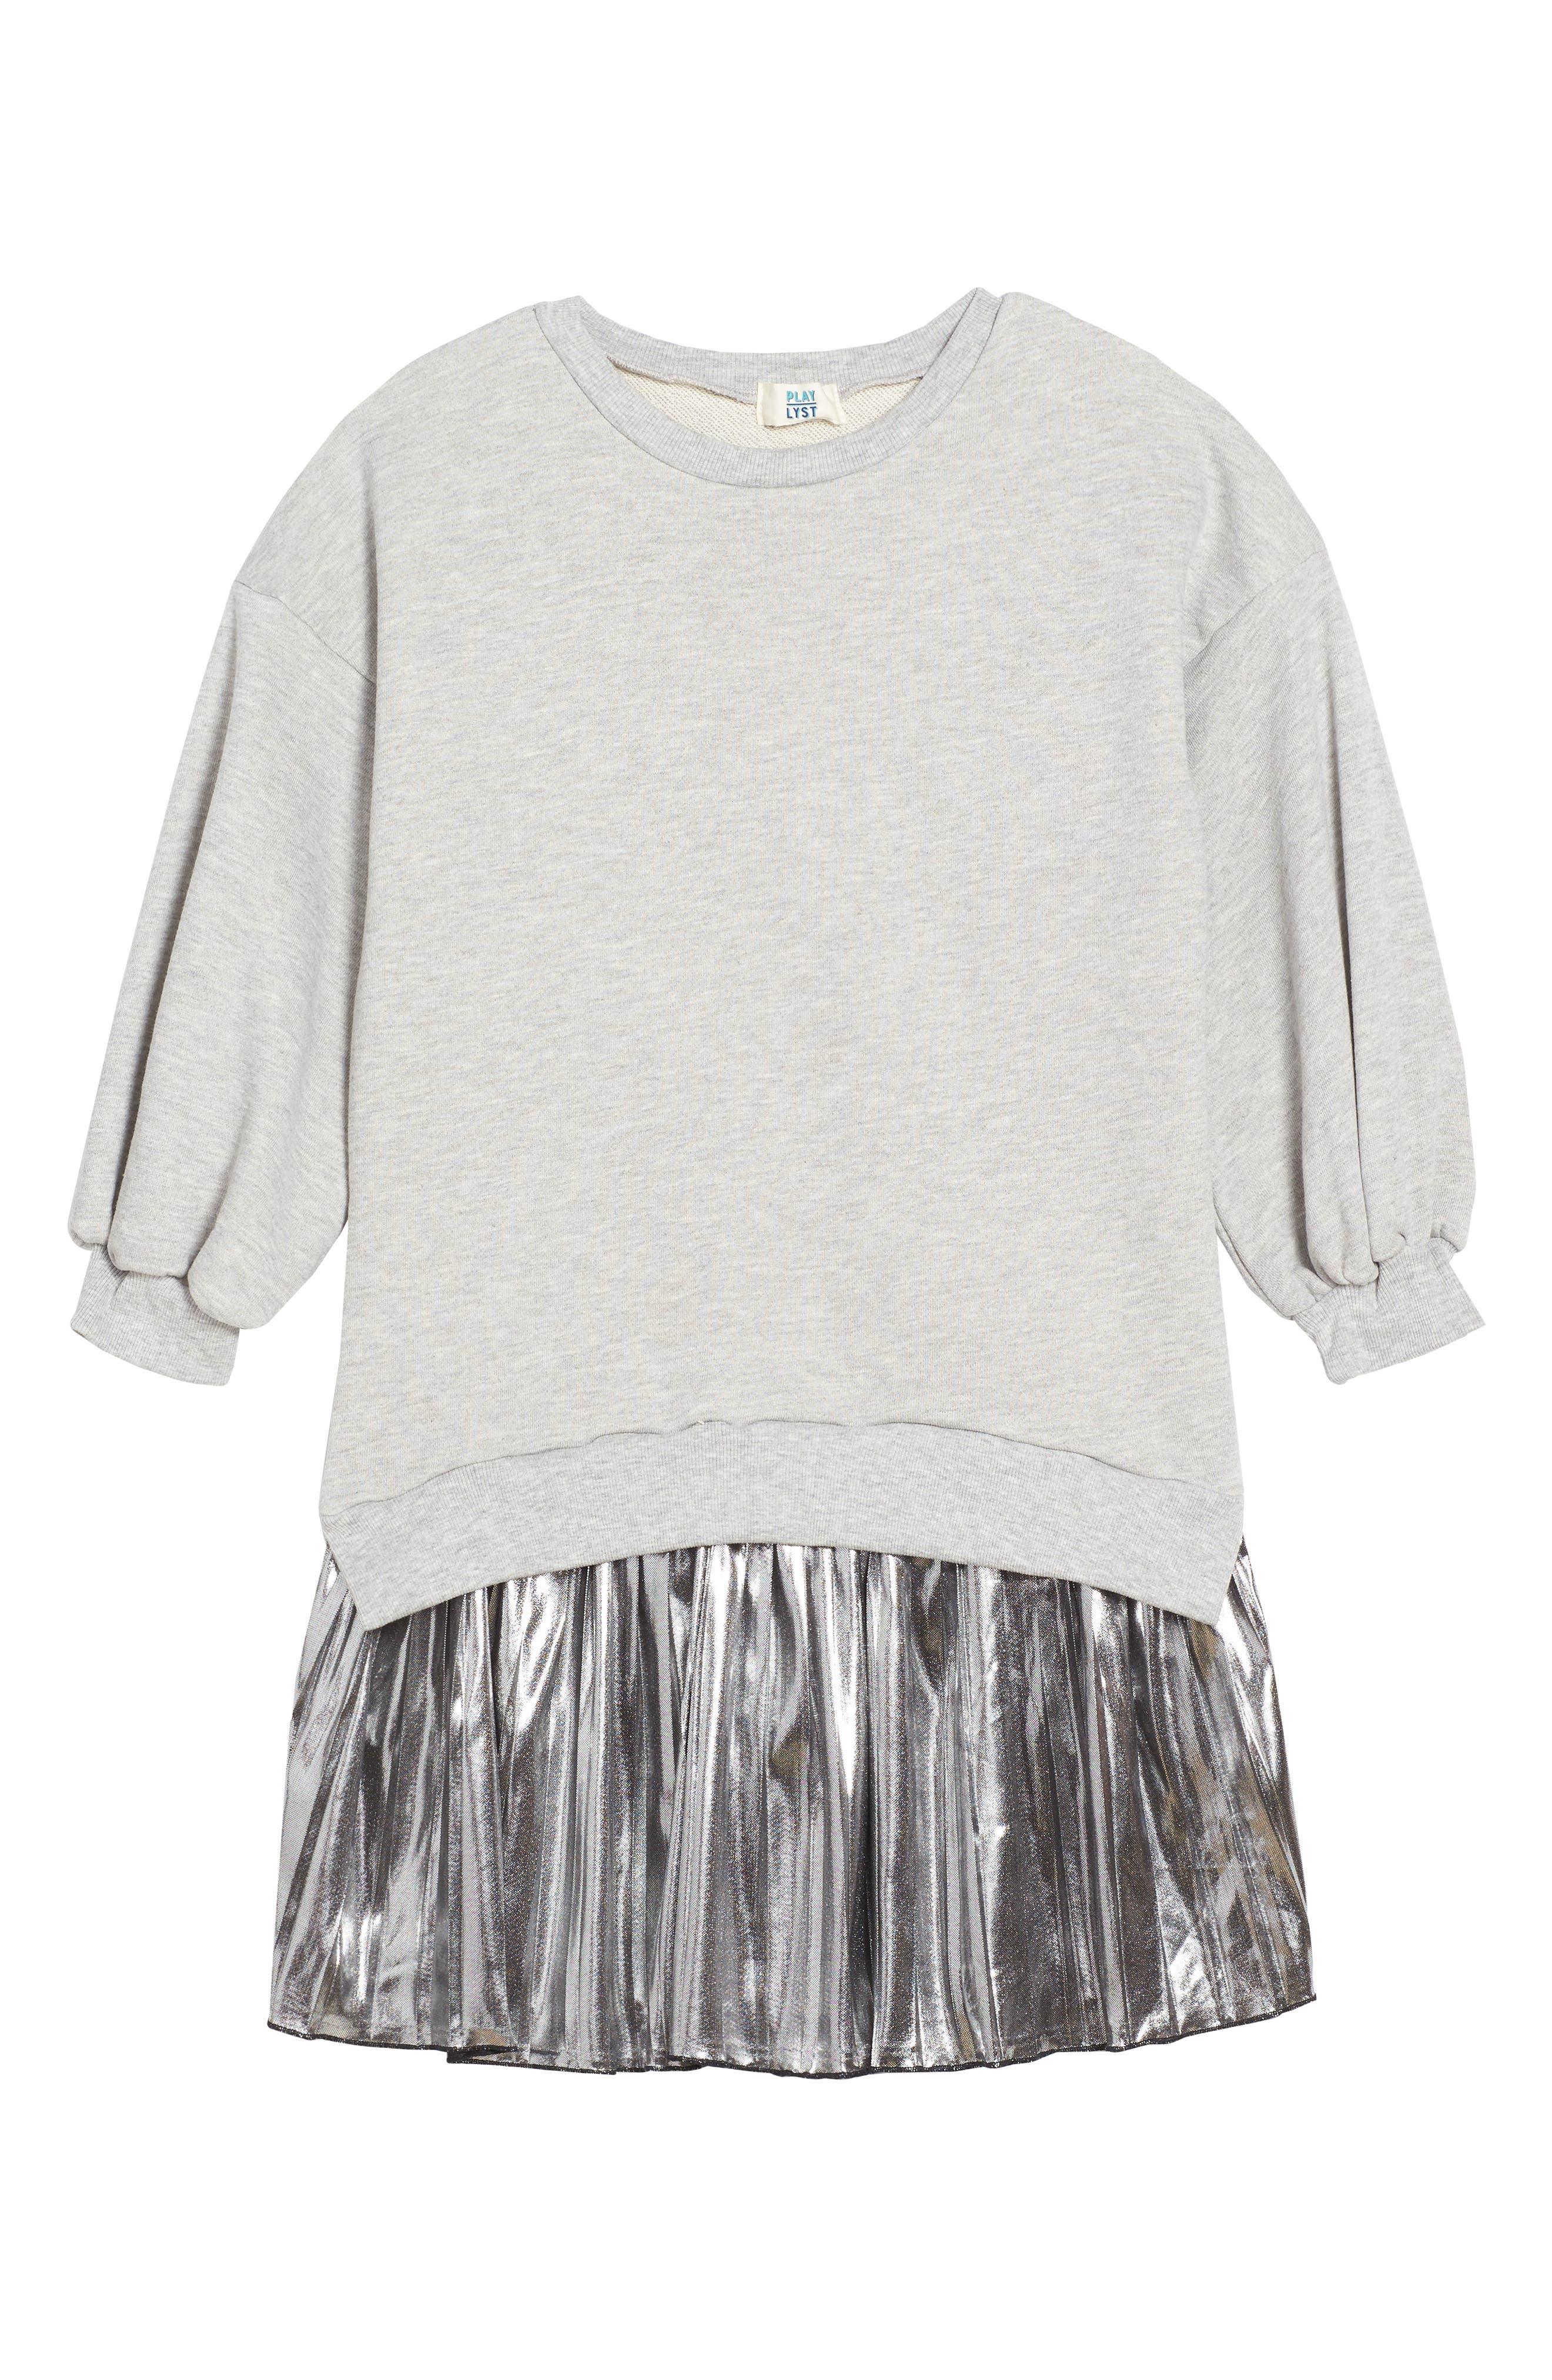 Metallic Sweatshirt Dress,                             Main thumbnail 1, color,                             Grey